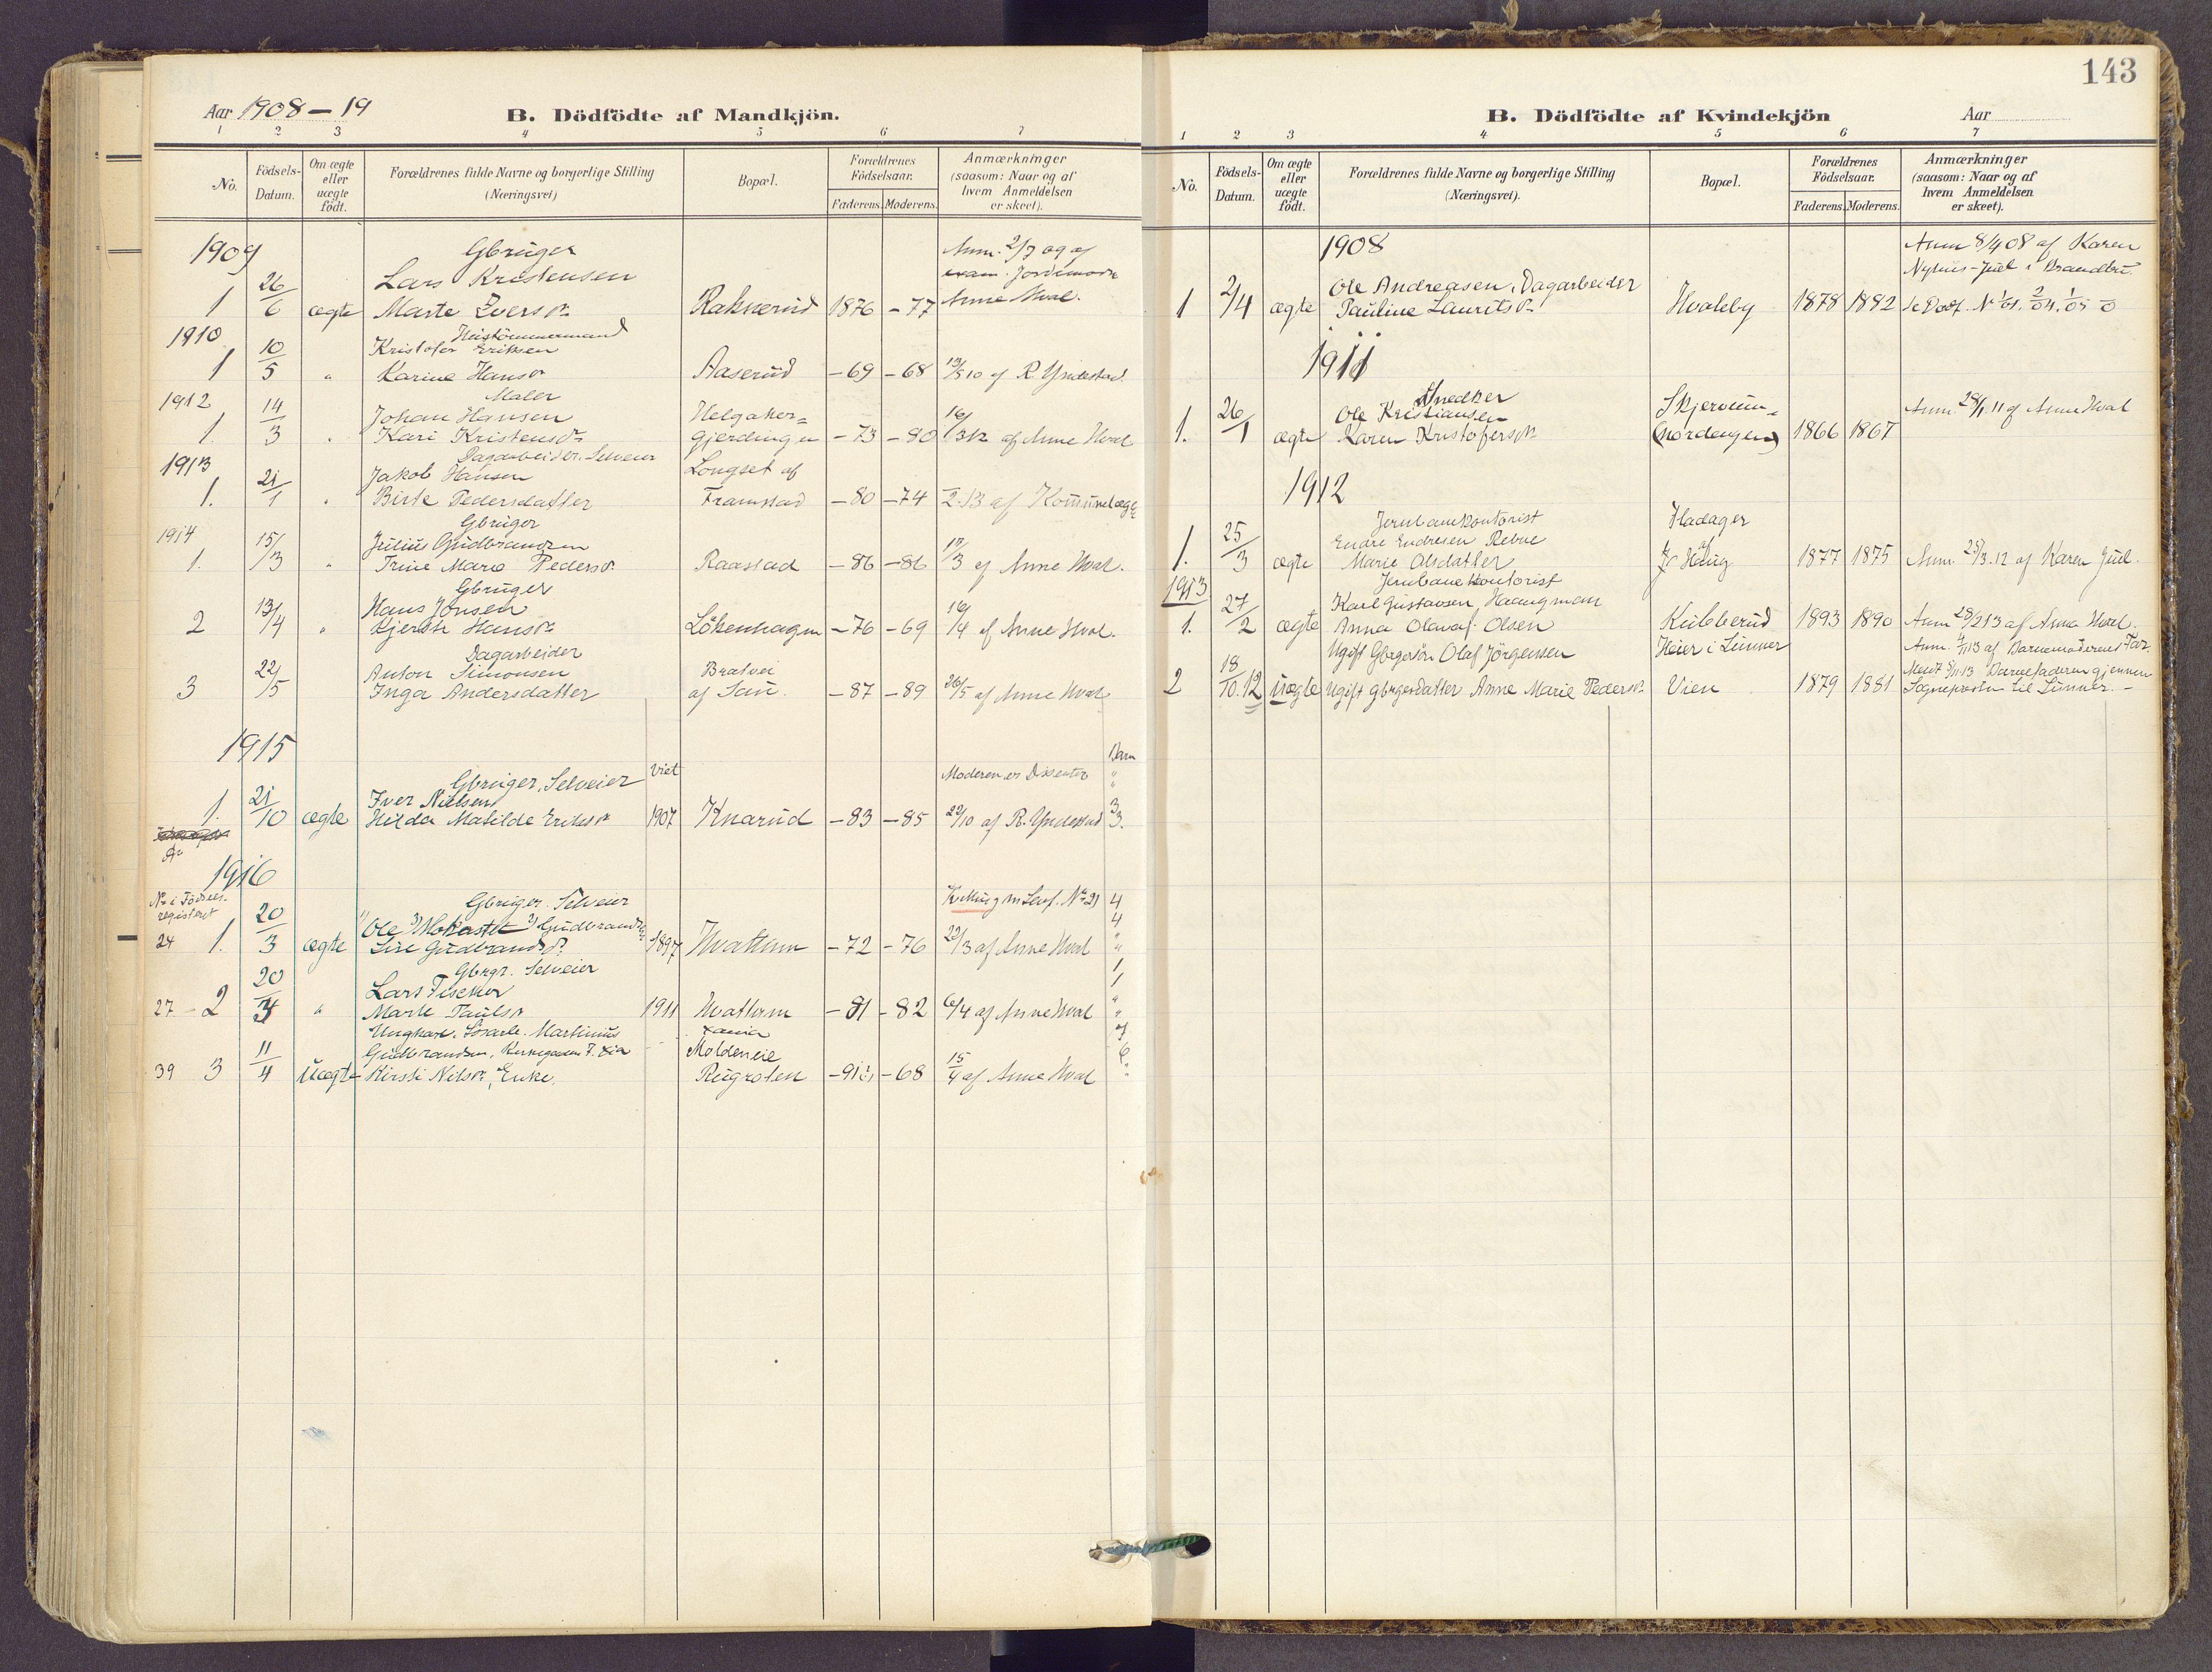 SAH, Gran prestekontor, Ministerialbok nr. 21, 1908-1932, s. 143